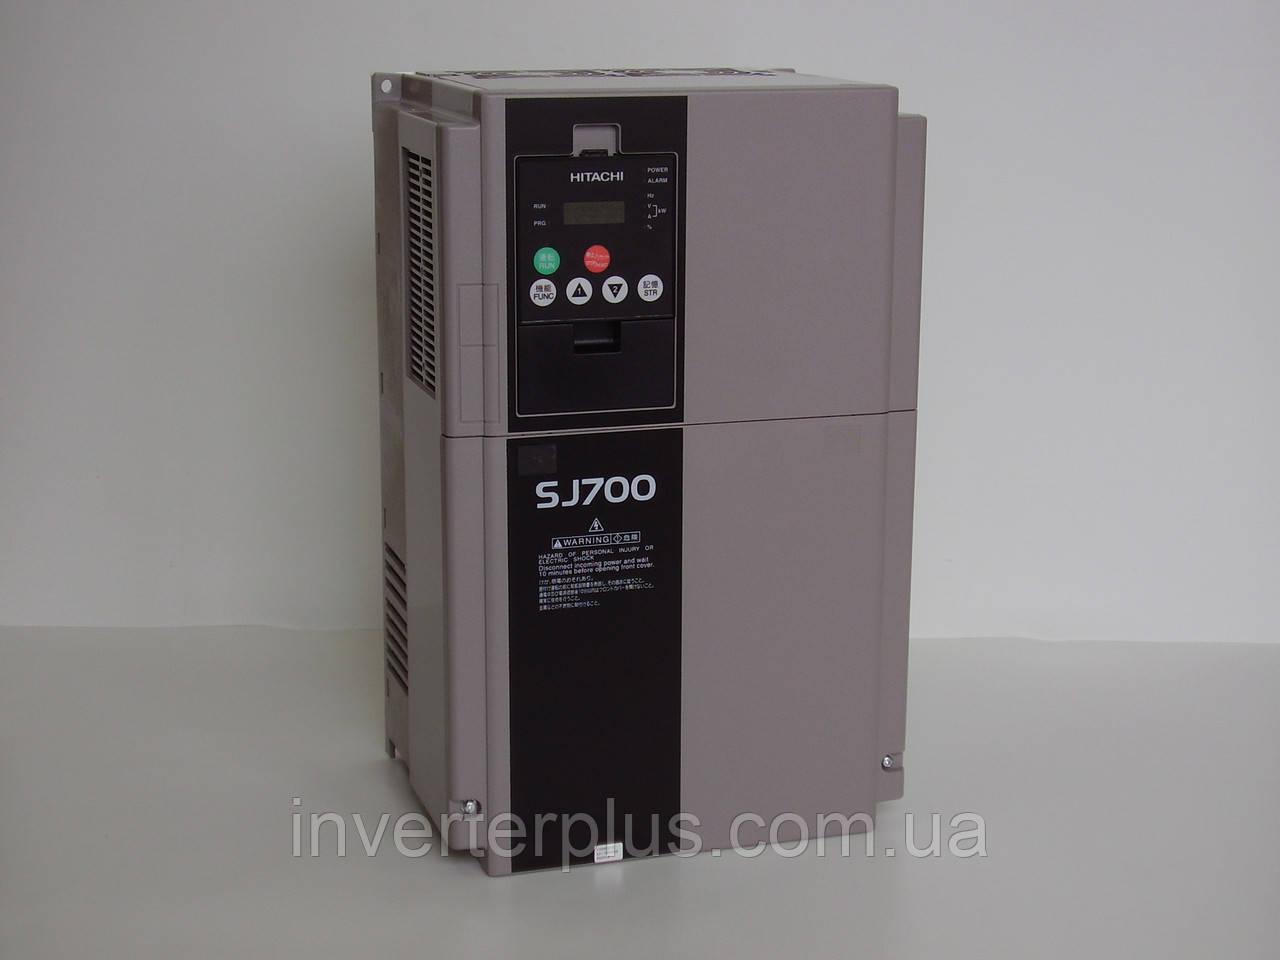 SJ700D-075HFEF3; 7,5кВт/380В. Частотний перетворювач Hitachi